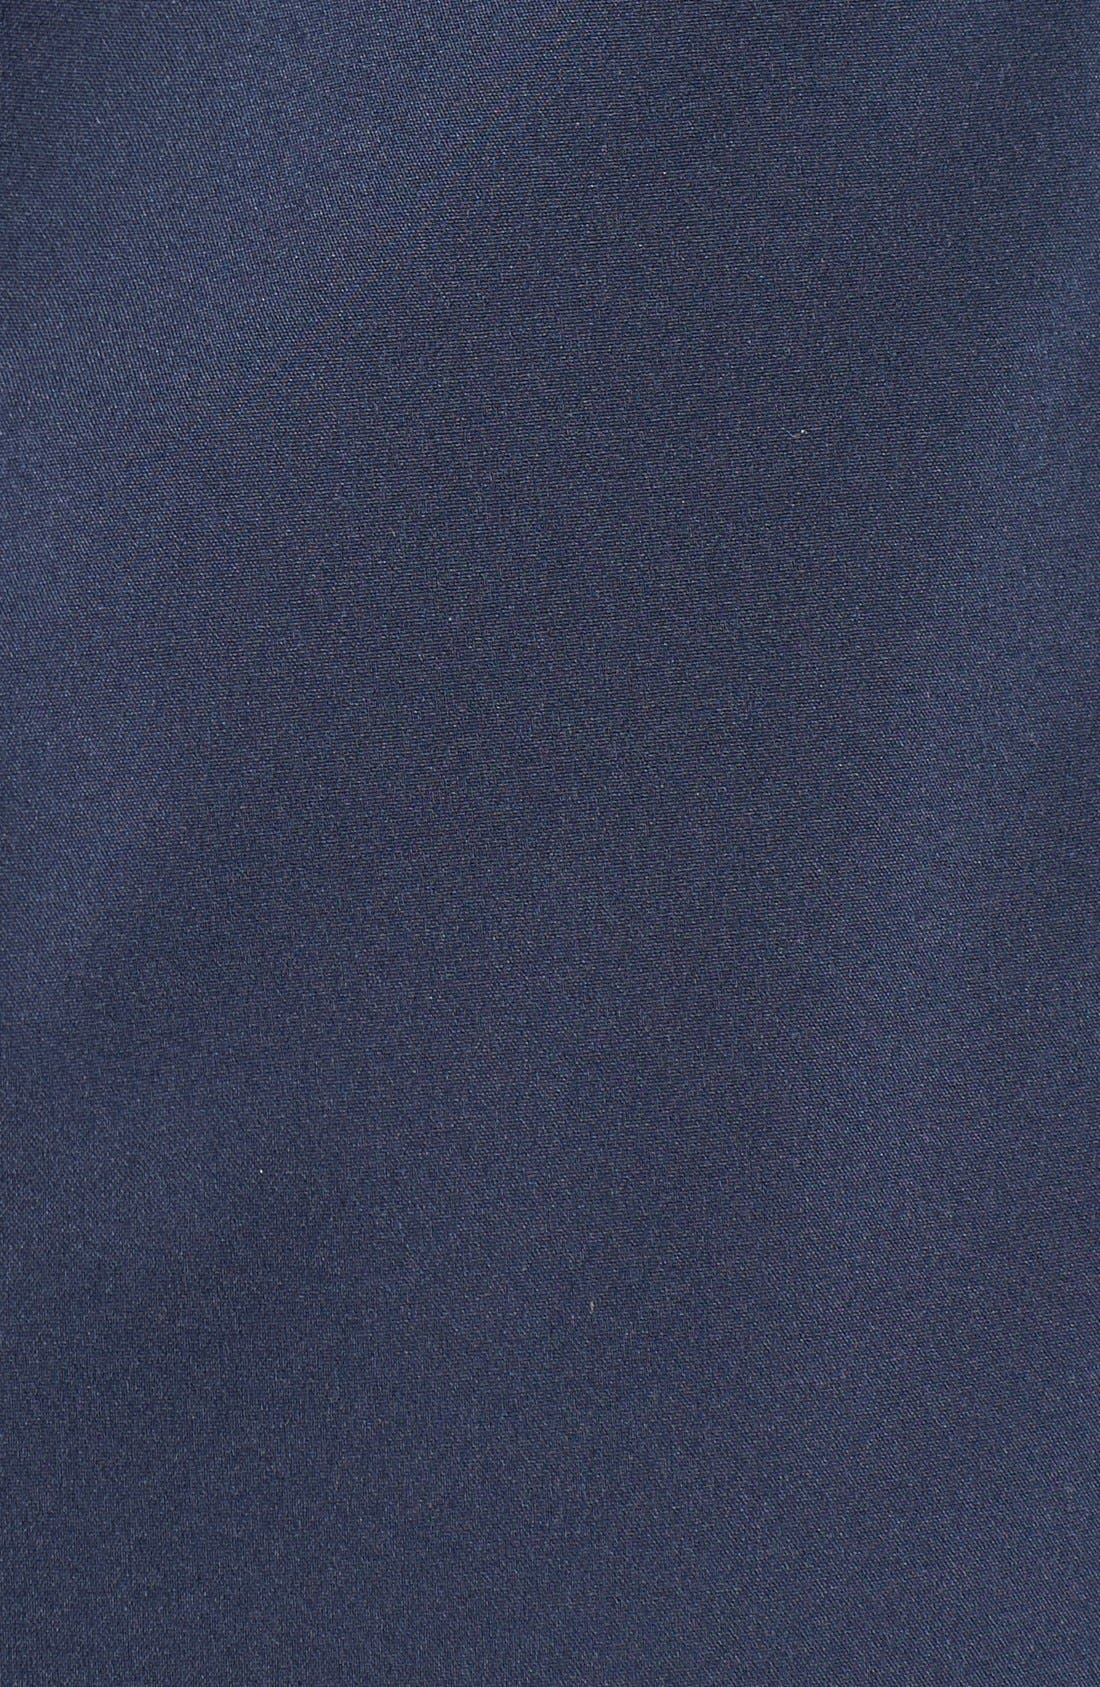 Alternate Image 3  - MICHAEL Michael Kors Faux Leather Trim Soft Shell Jacket (Regular & Petite)